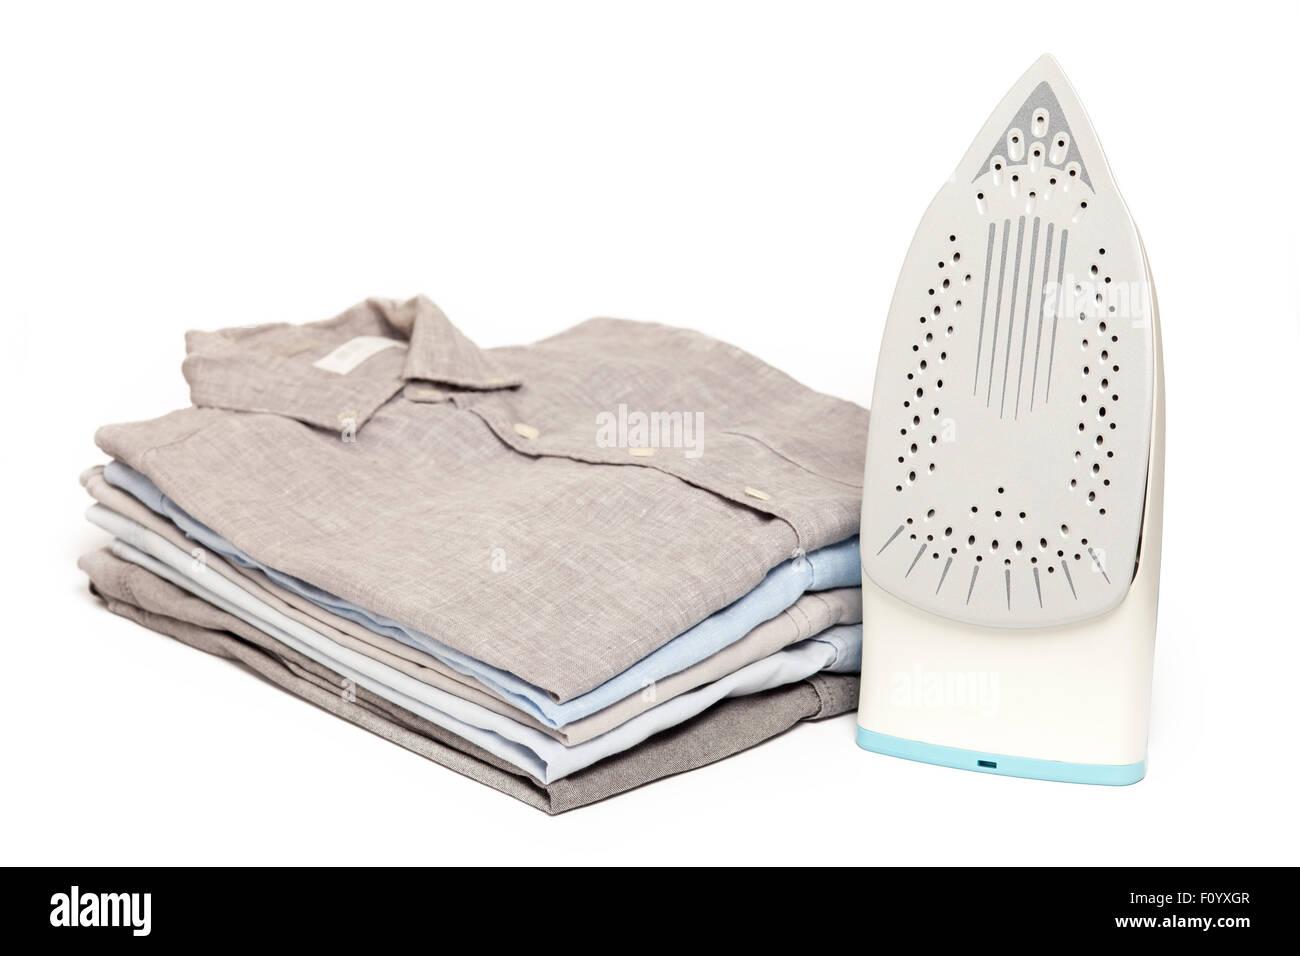 ironed stockfotos ironed bilder alamy. Black Bedroom Furniture Sets. Home Design Ideas